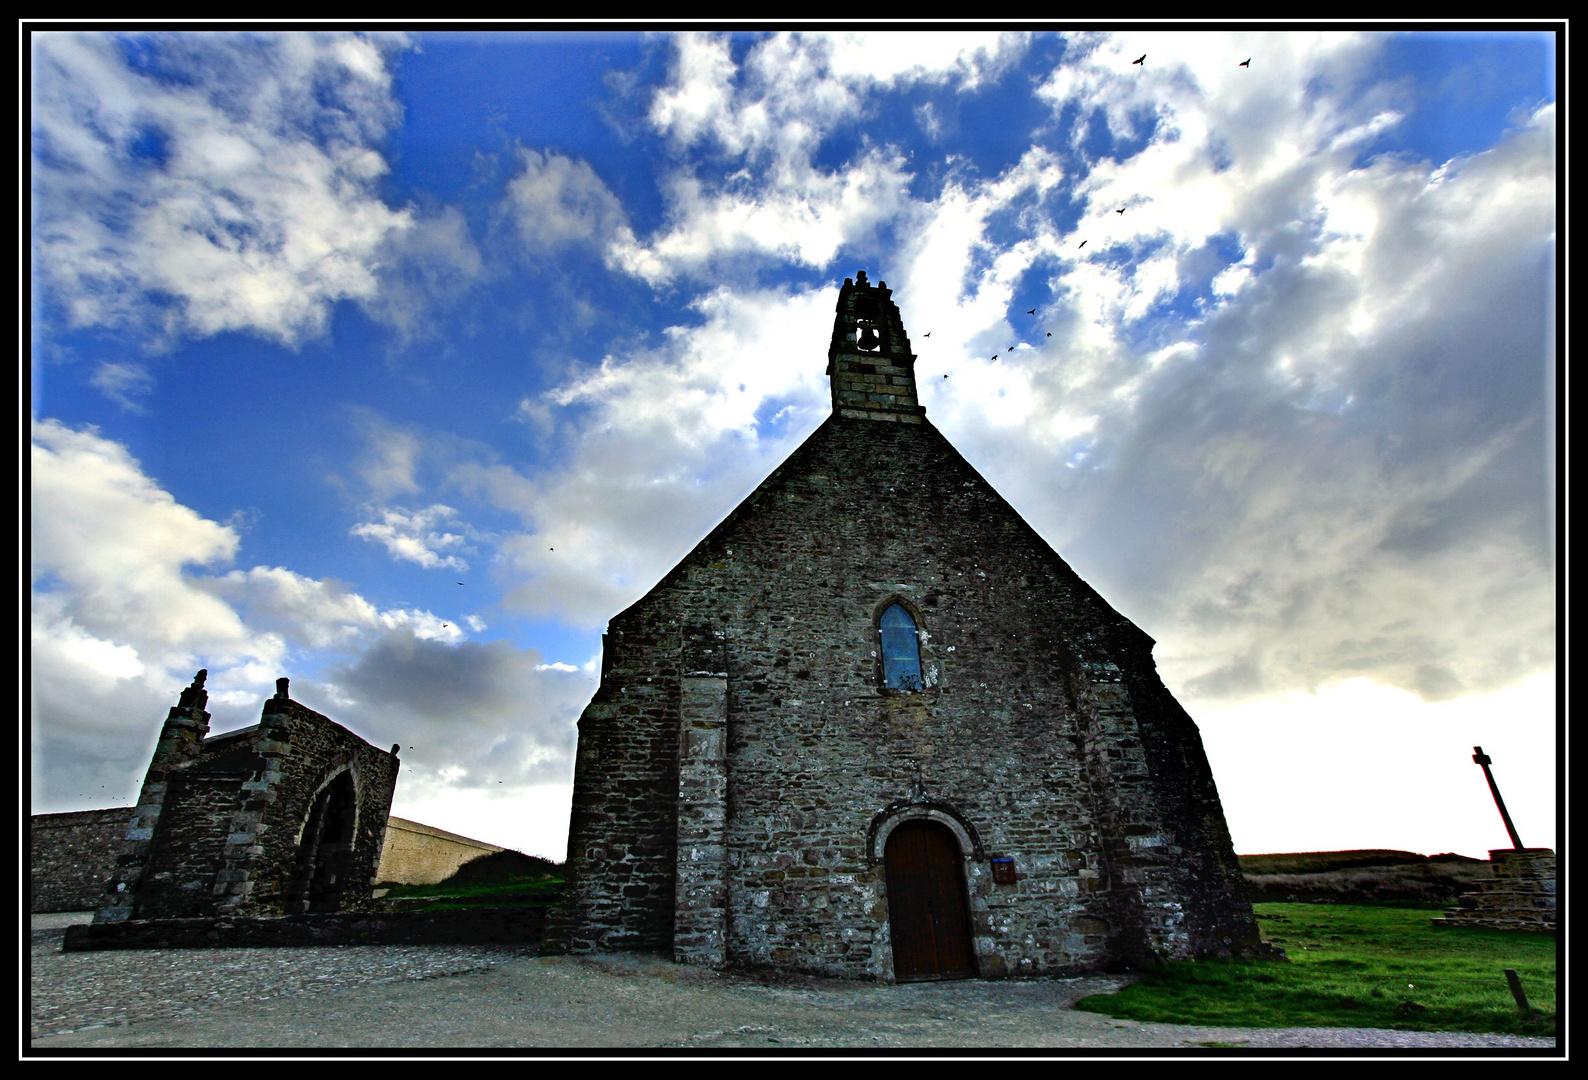 Kapelle von Saint Mathieu